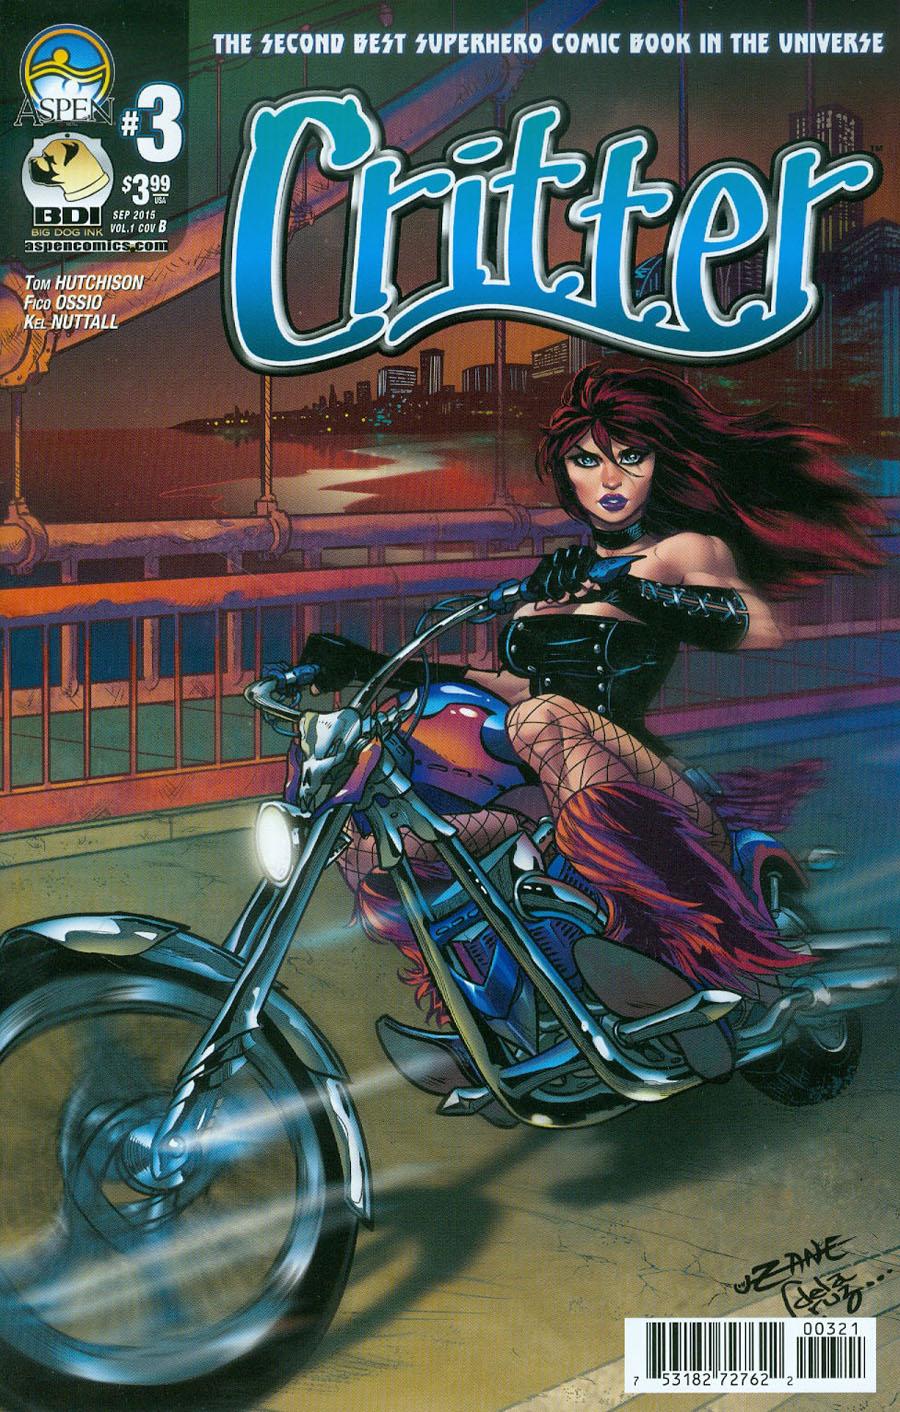 Critter Vol 3 #3 Cover B Variant Corey Zayatz Cover